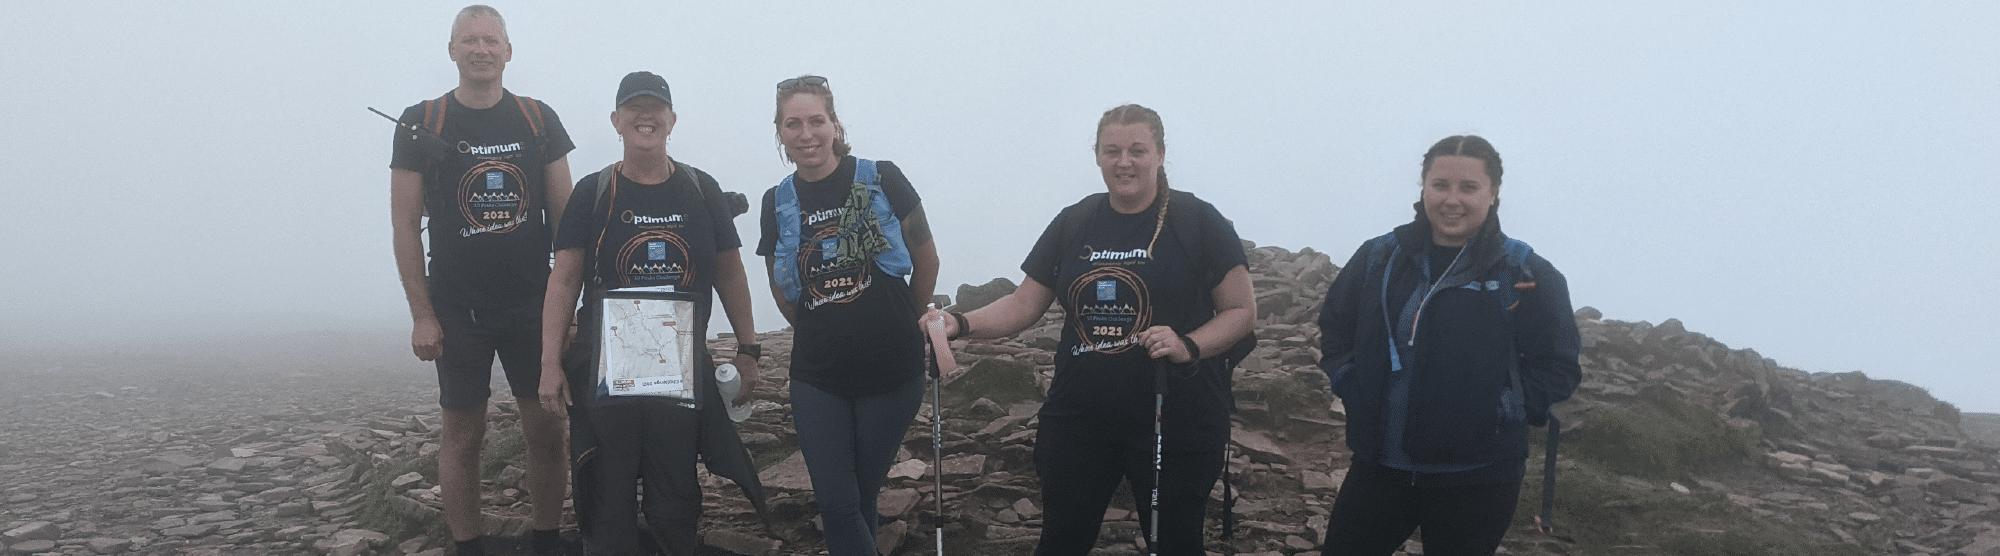 Optimum charity support 10 peaks challenge 2021